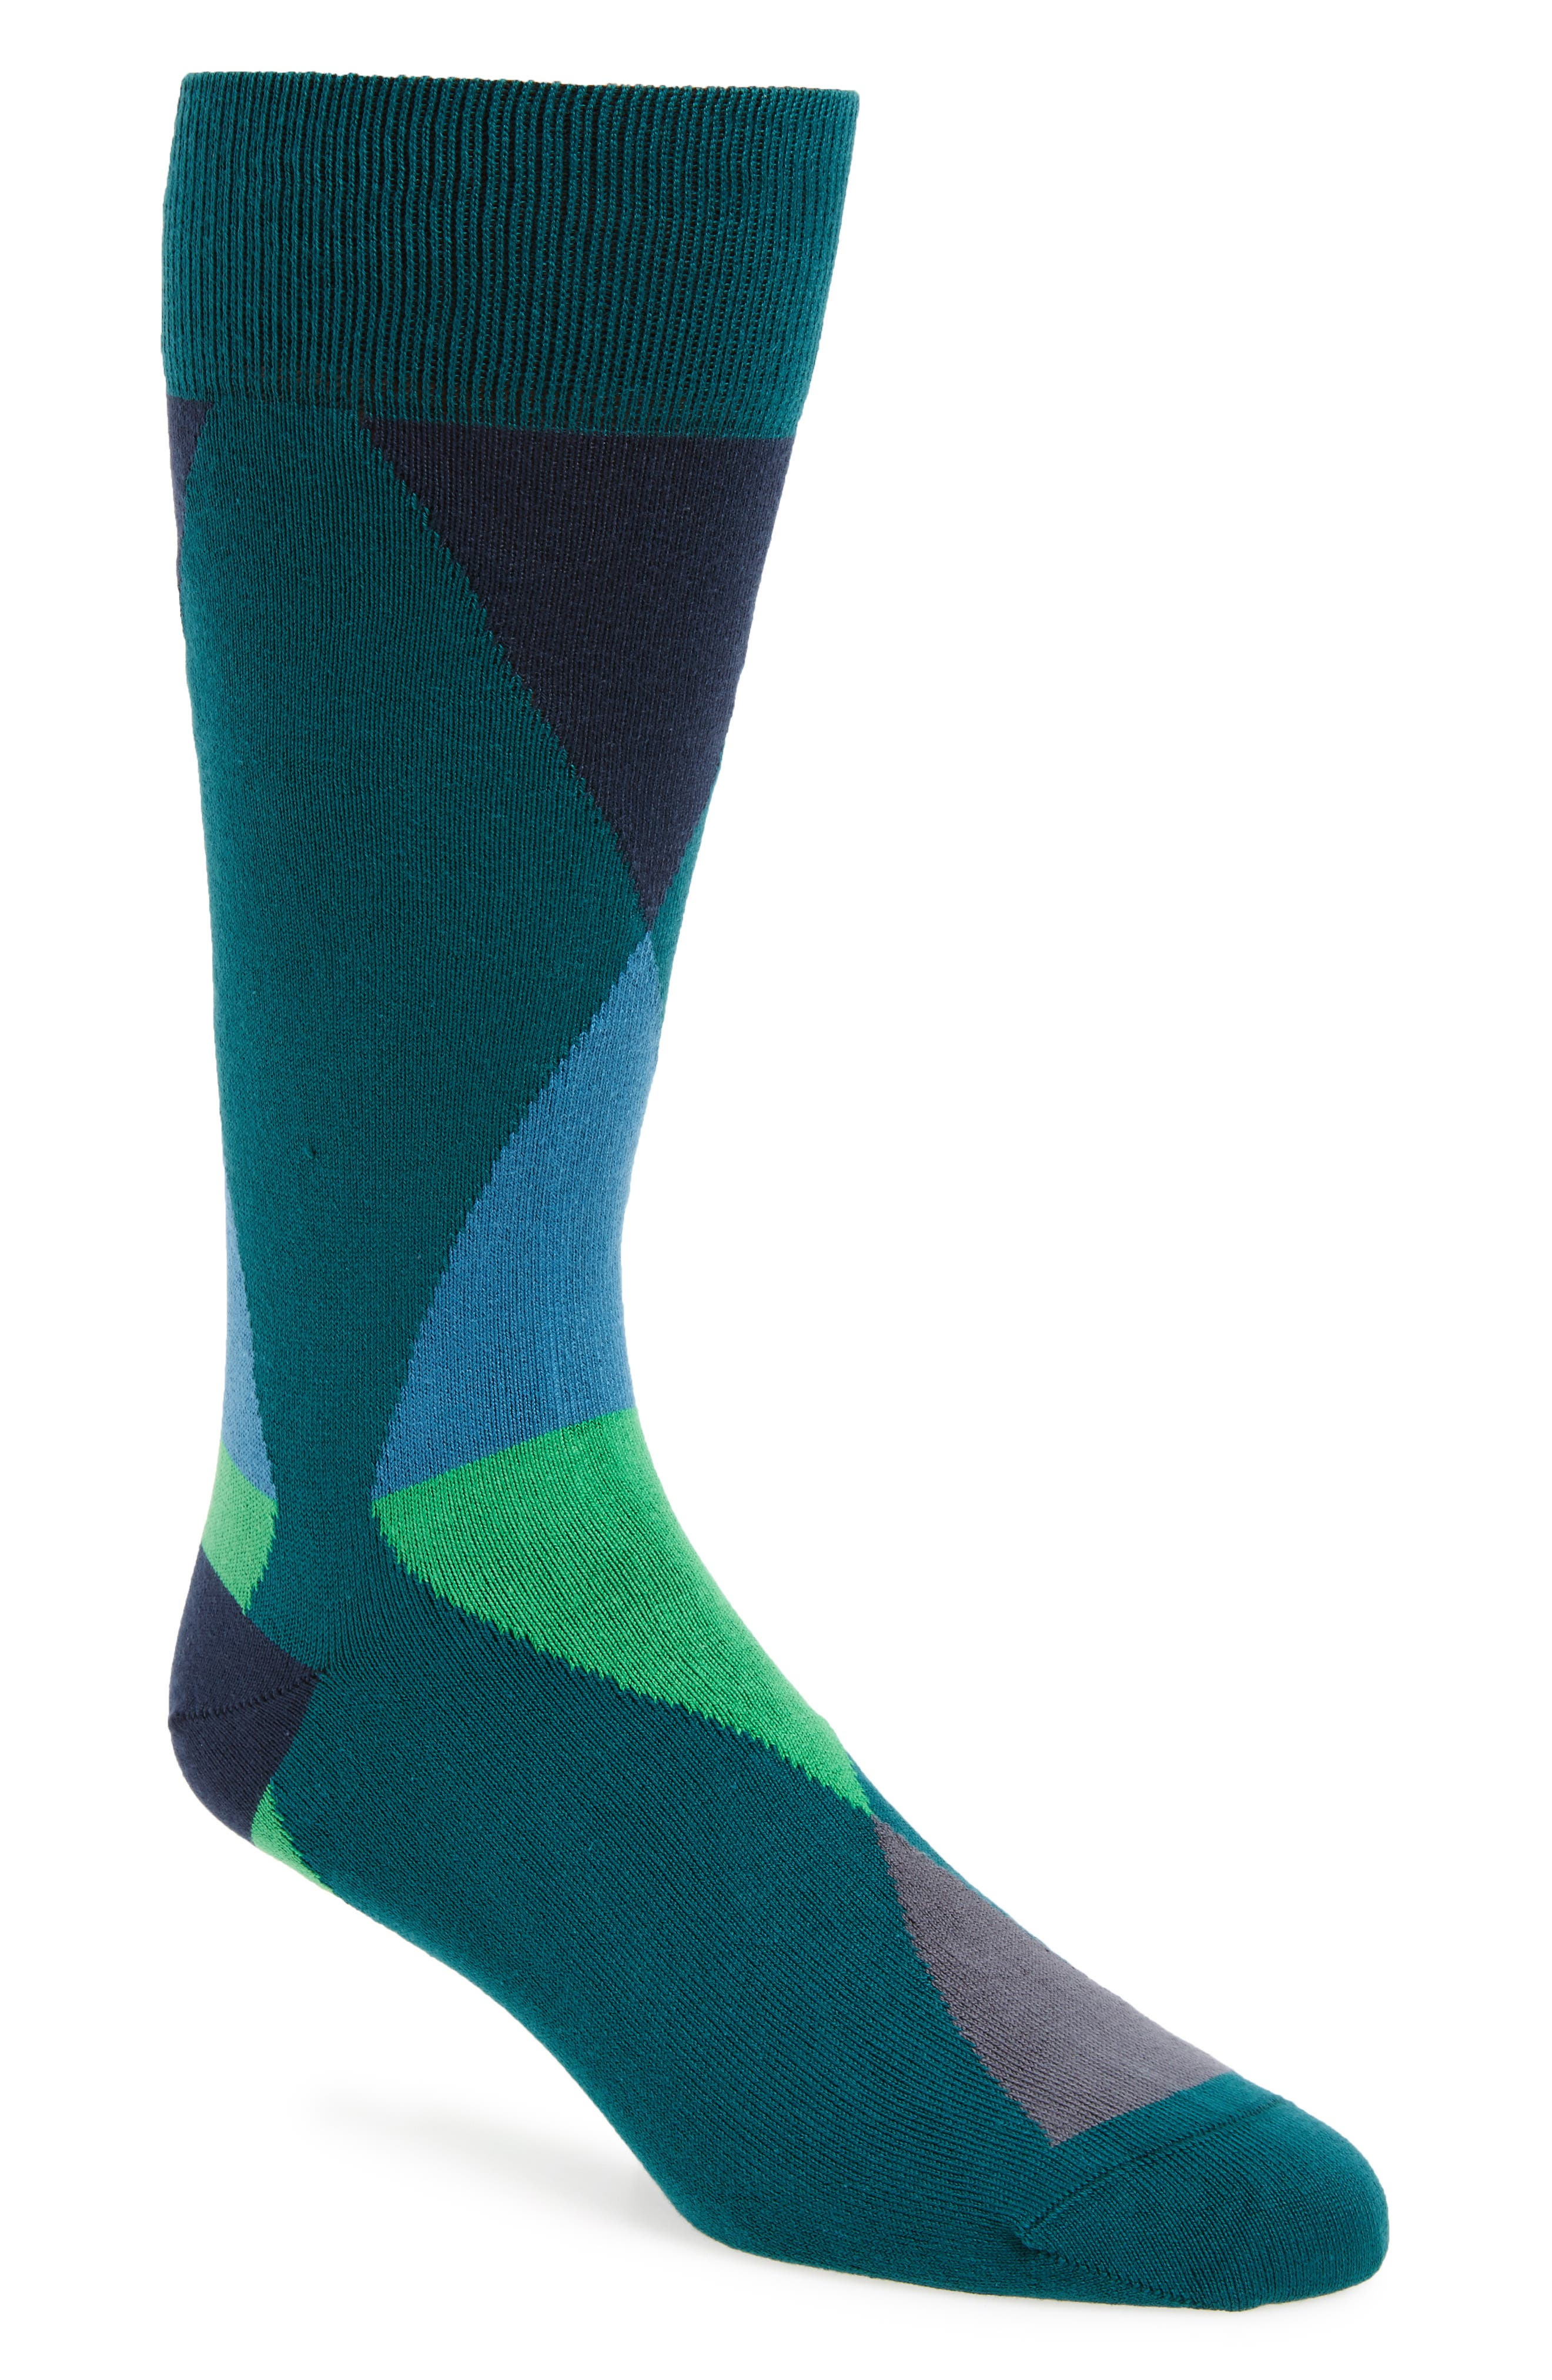 Geo Geometric Socks,                         Main,                         color, Dark Blue